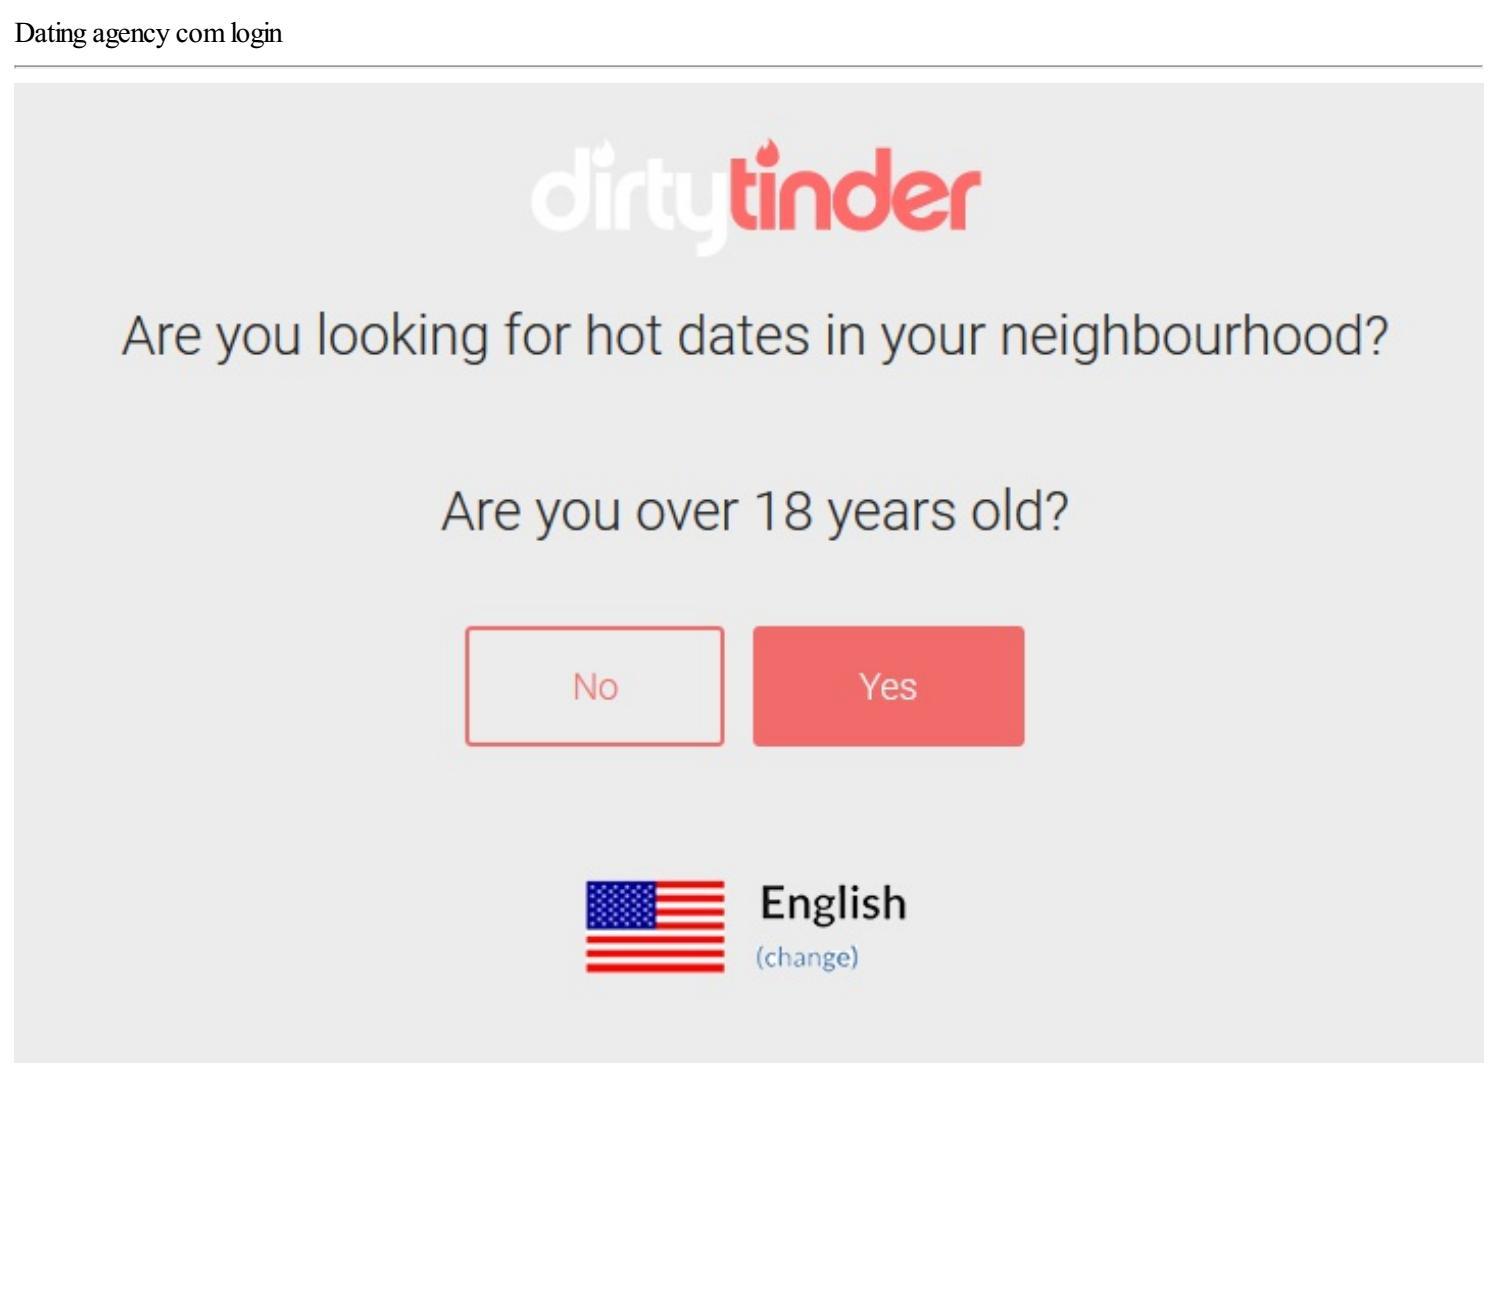 Dating agency com login